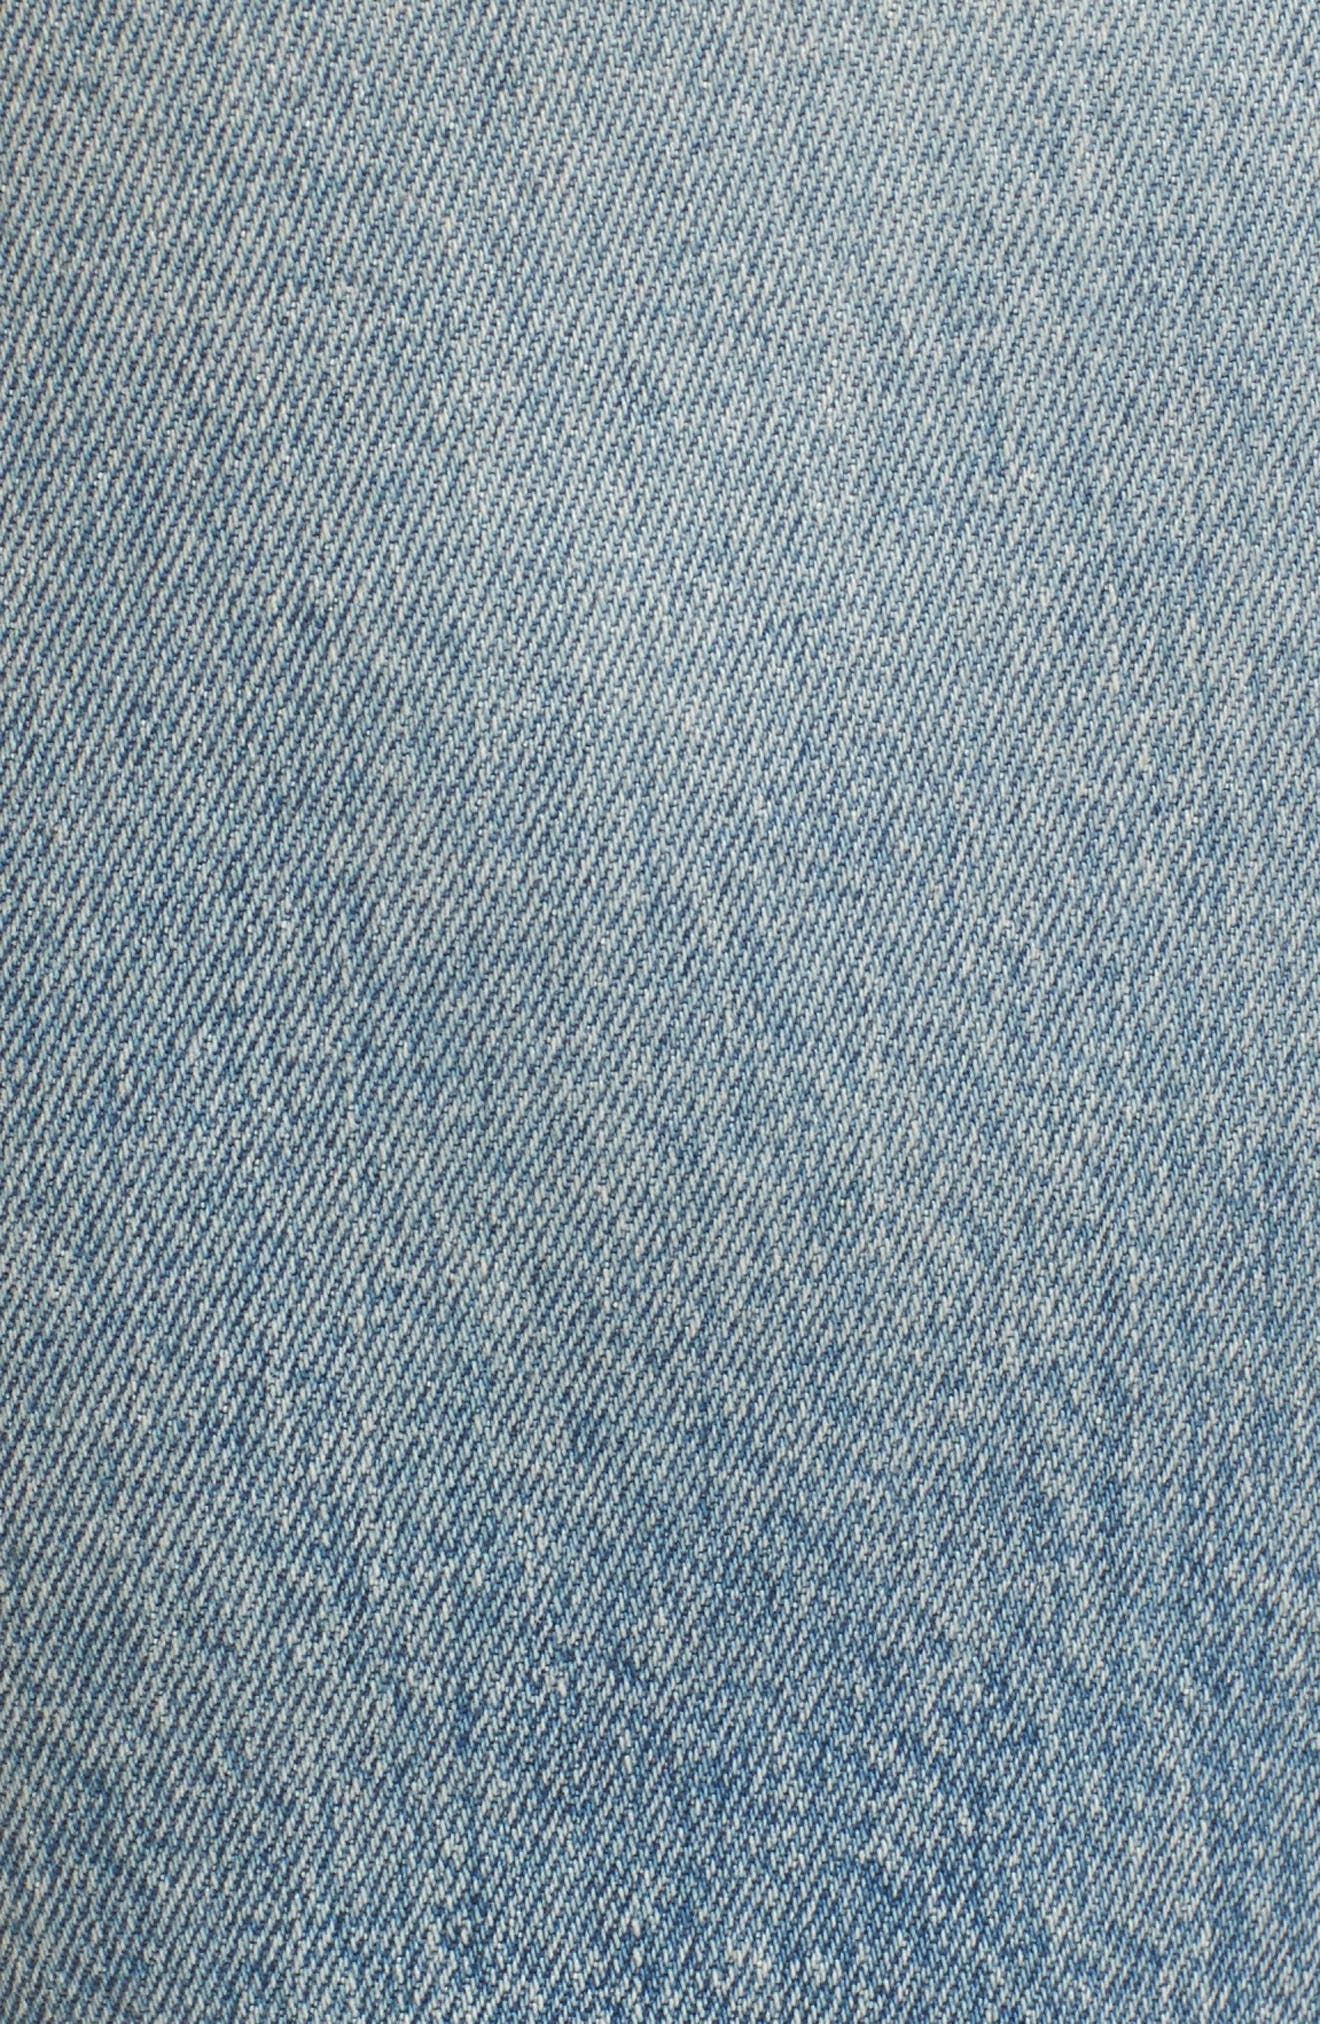 Boy Clean Jeans,                             Alternate thumbnail 5, color,                             LEYTON